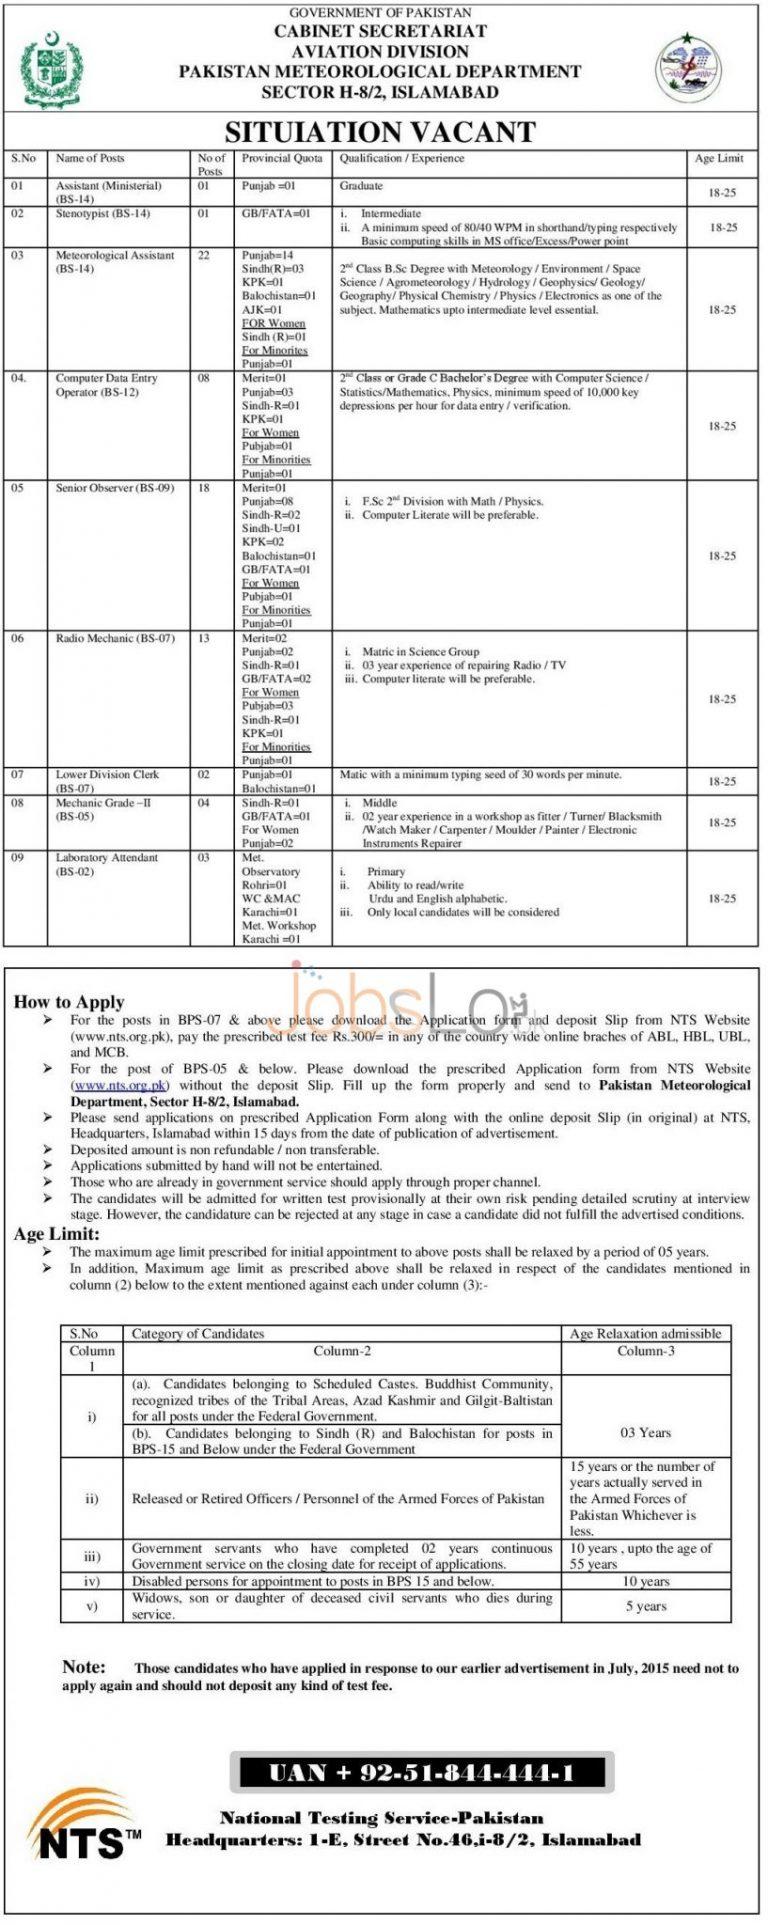 Pakistan Meteorological Department NTS Jobs Nov 2015 Application Form